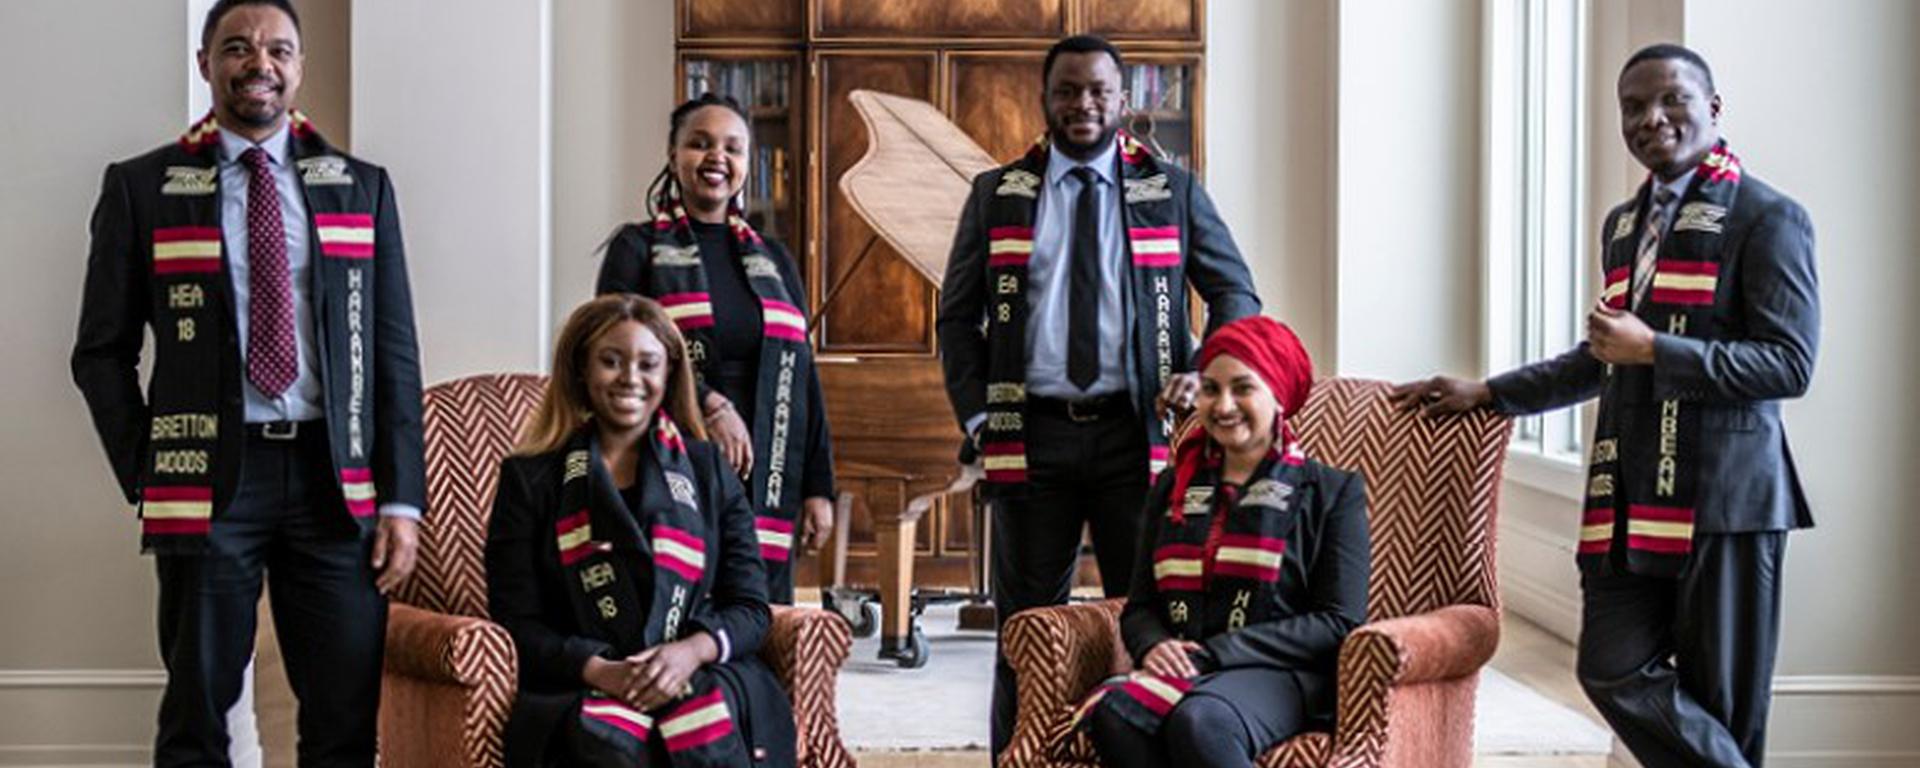 Harambeans - Harambeans Associate Program Movemeback African initiative cover image